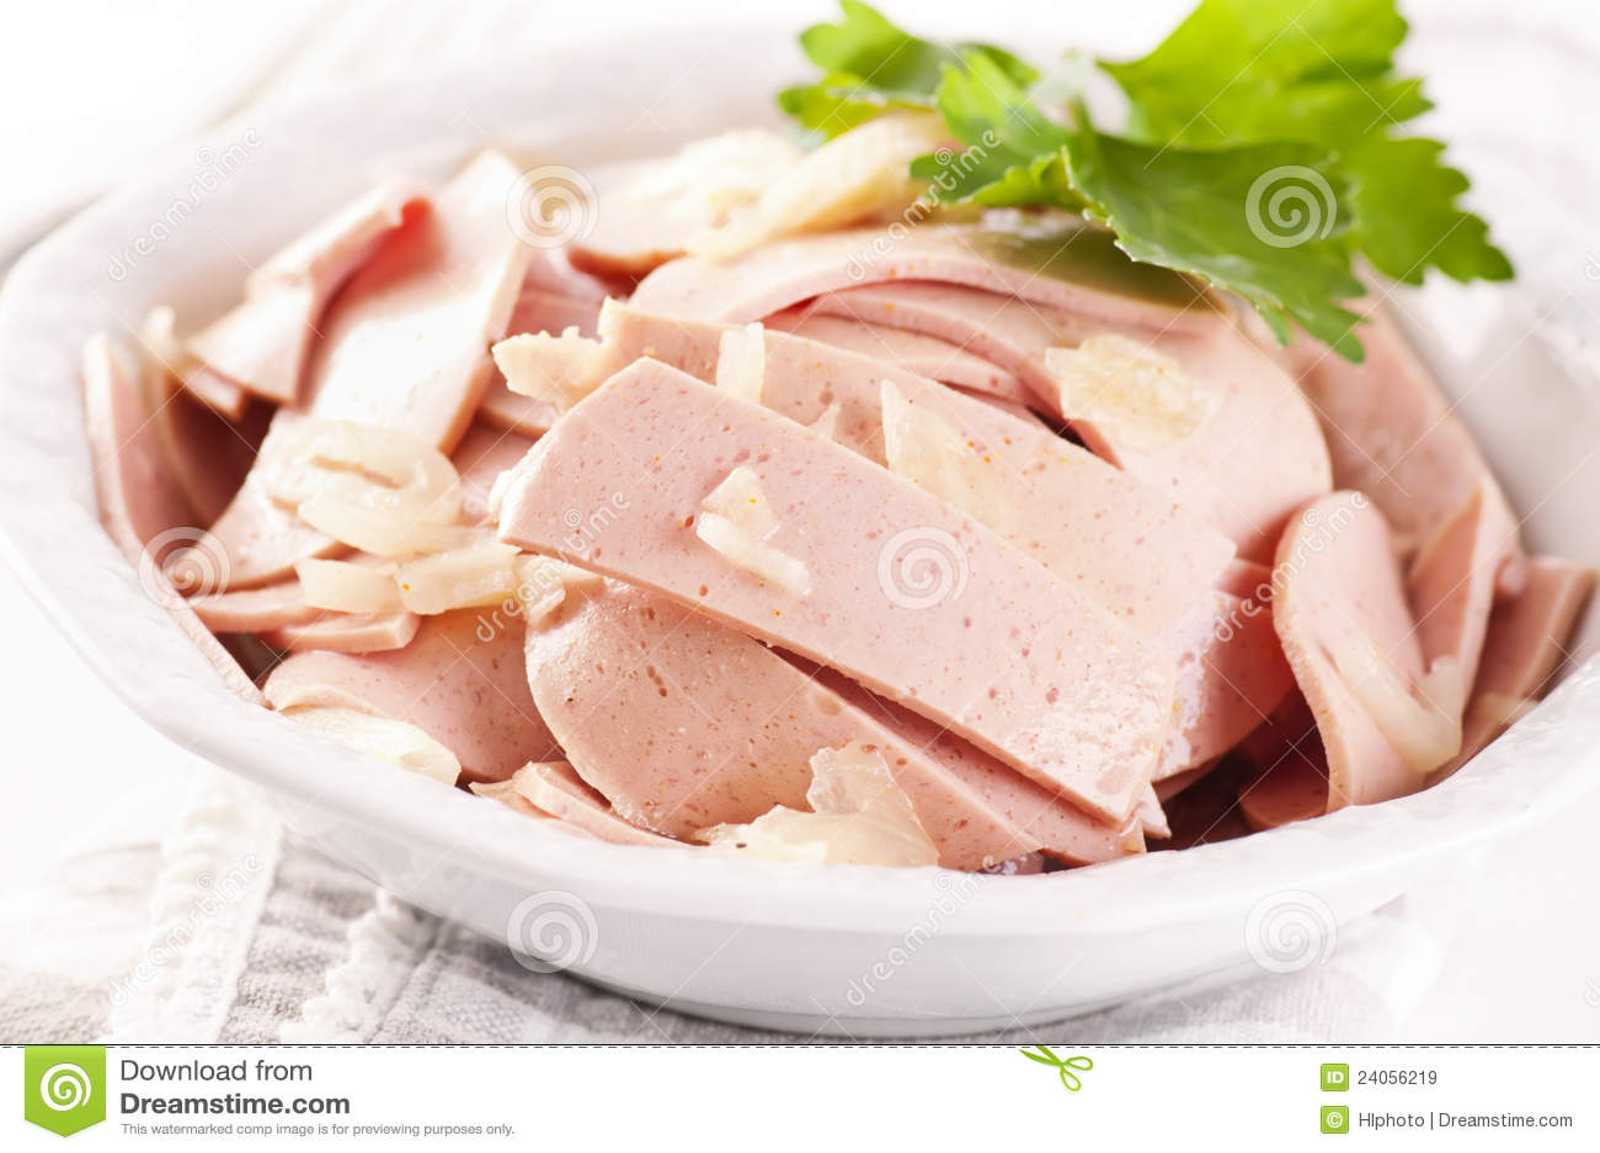 Royalty Free Stock Images: Bavarian sausage salad